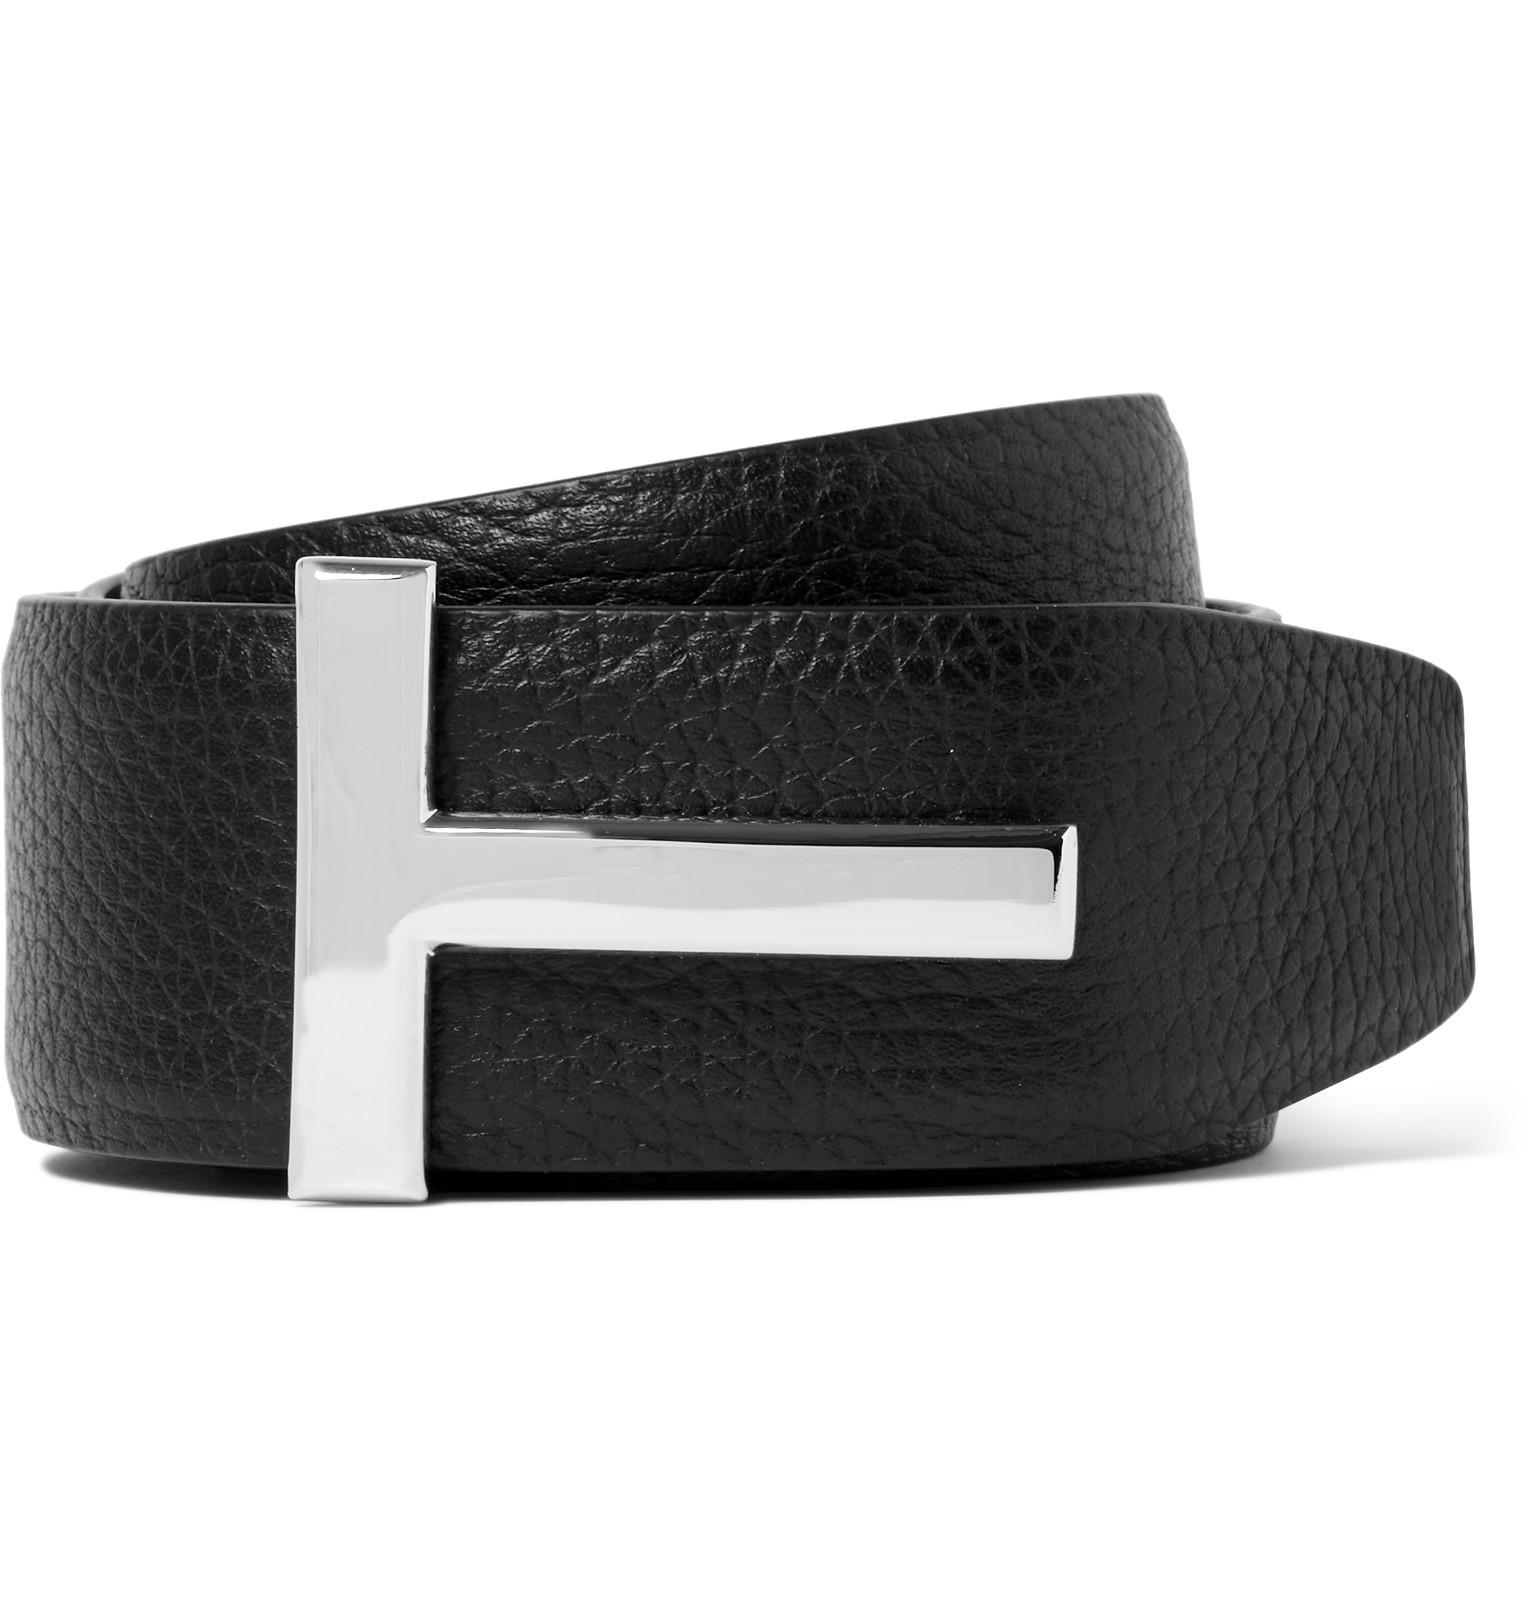 3d4390b748c Tom Ford 4cm Black Grained-leather Belt in Black for Men - Lyst